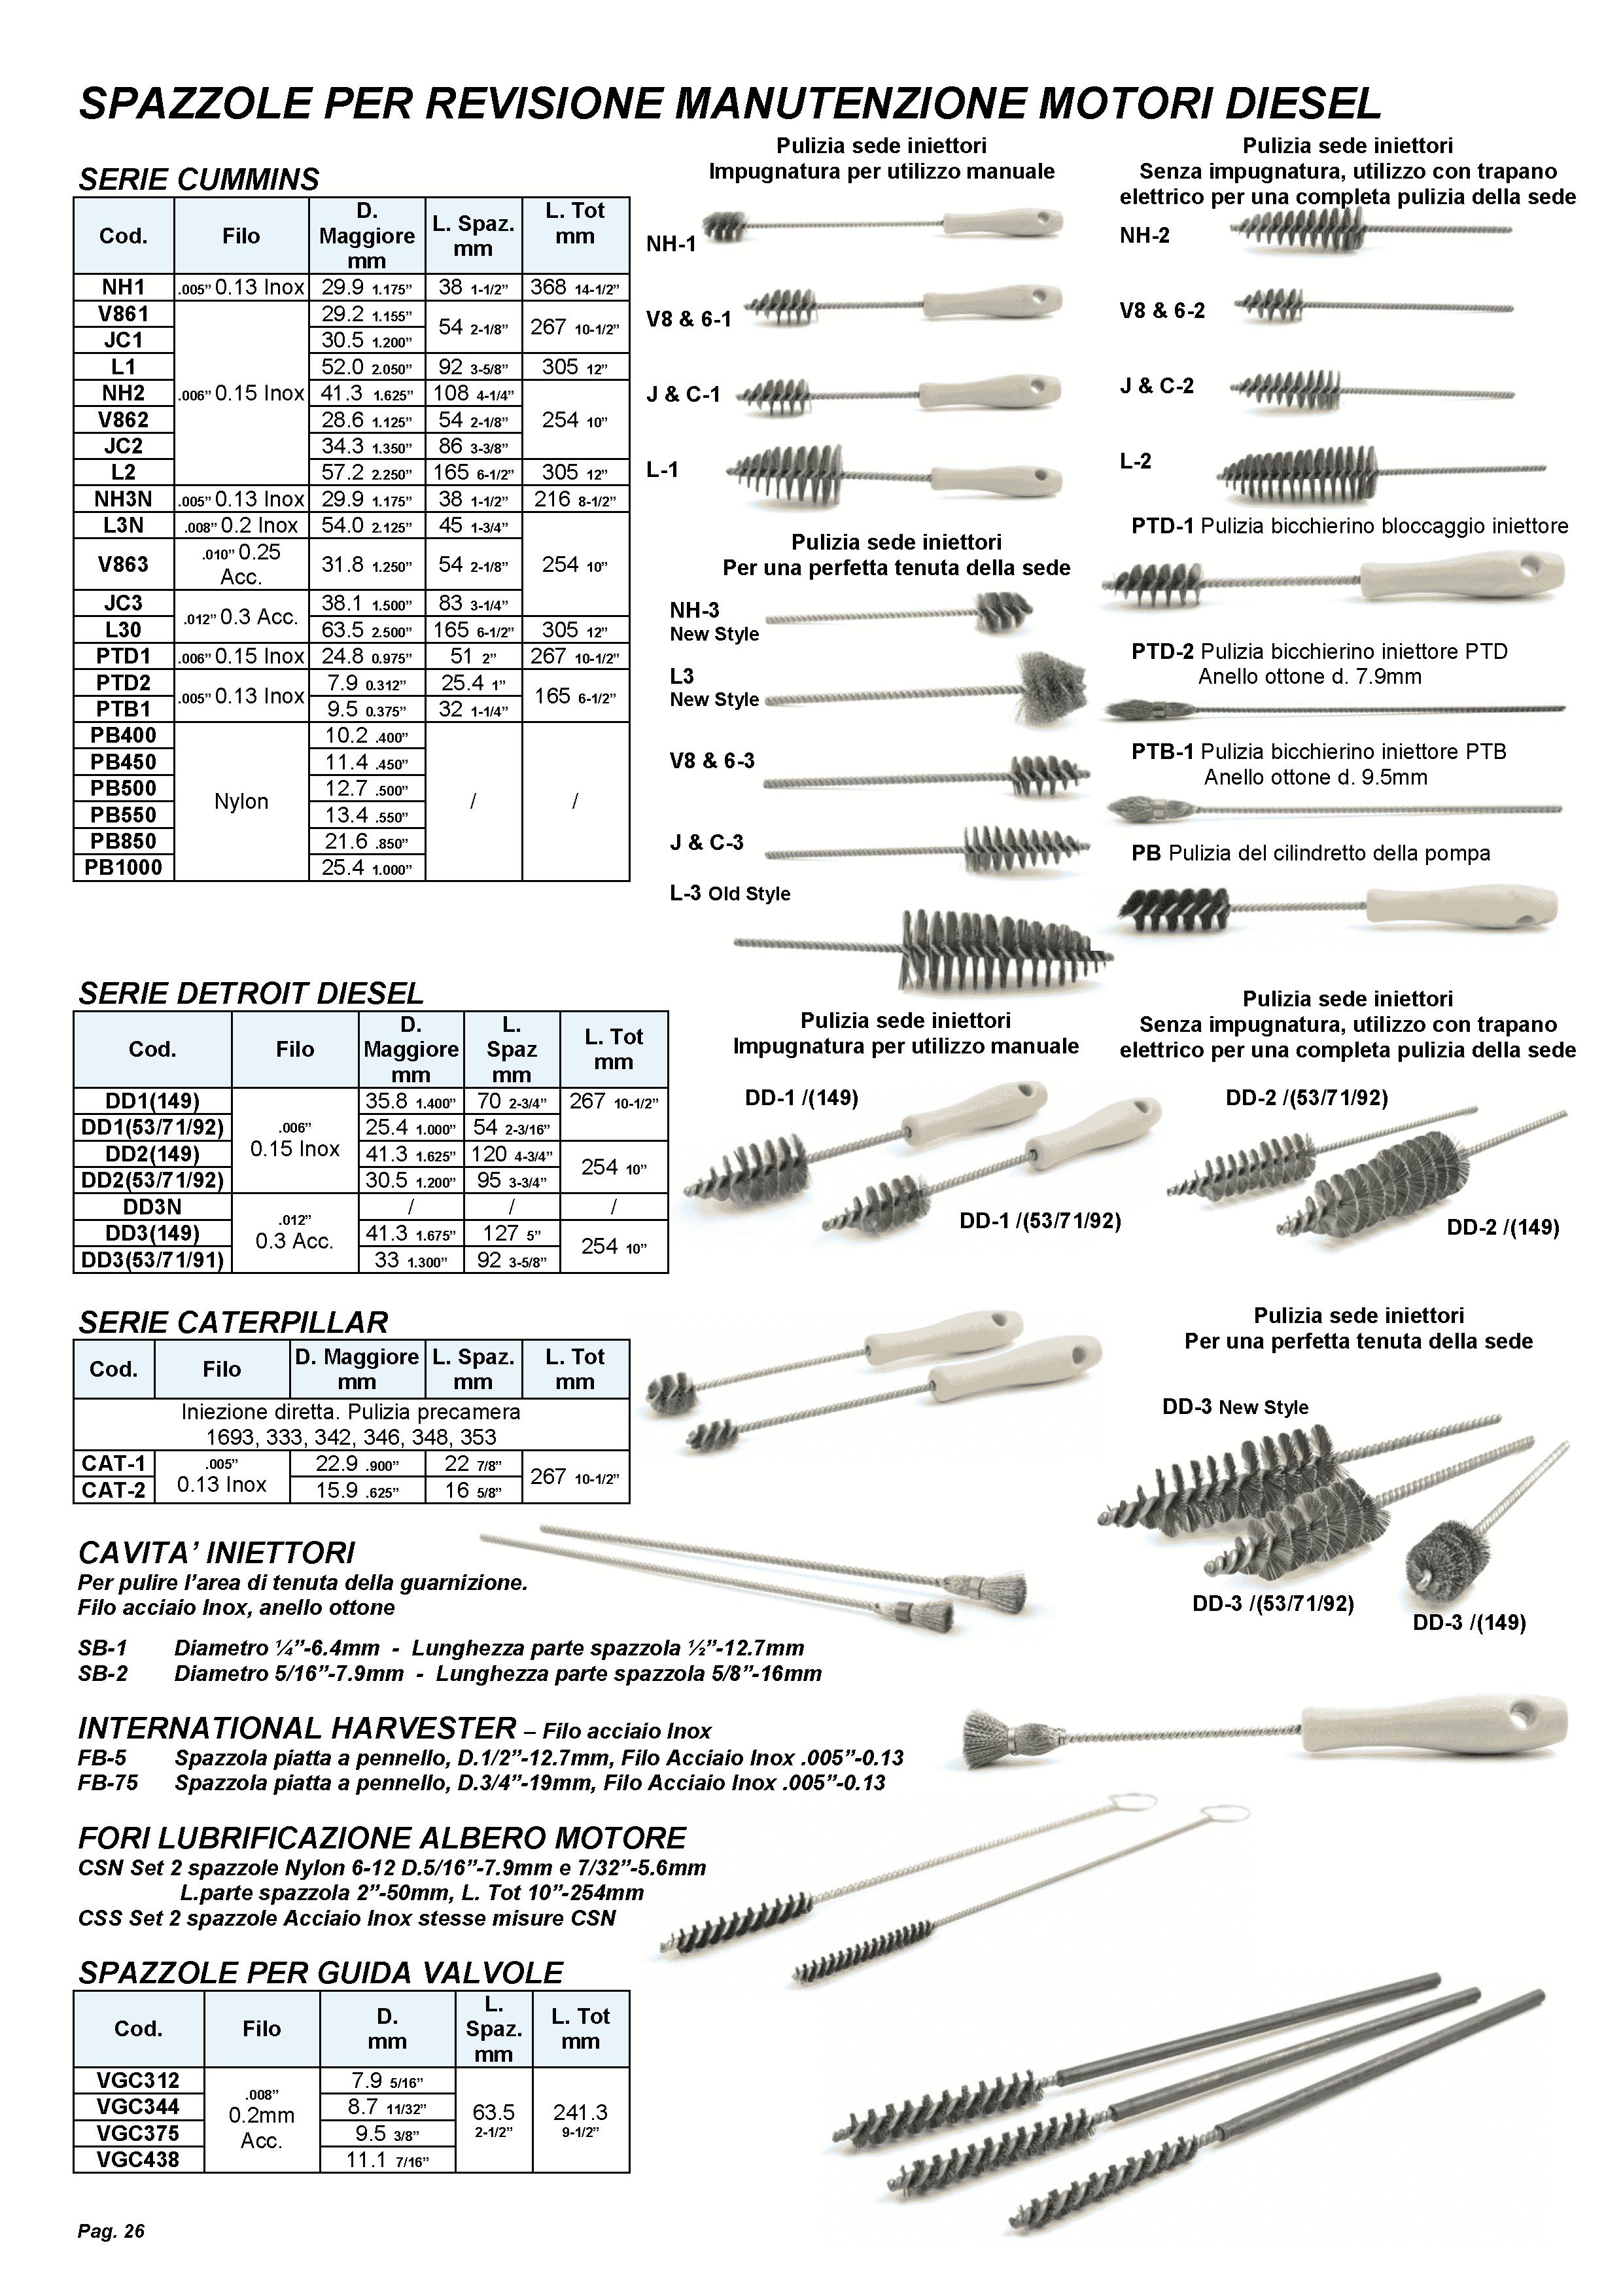 26-spazzole-revisione-manutenzione-motori-diesel